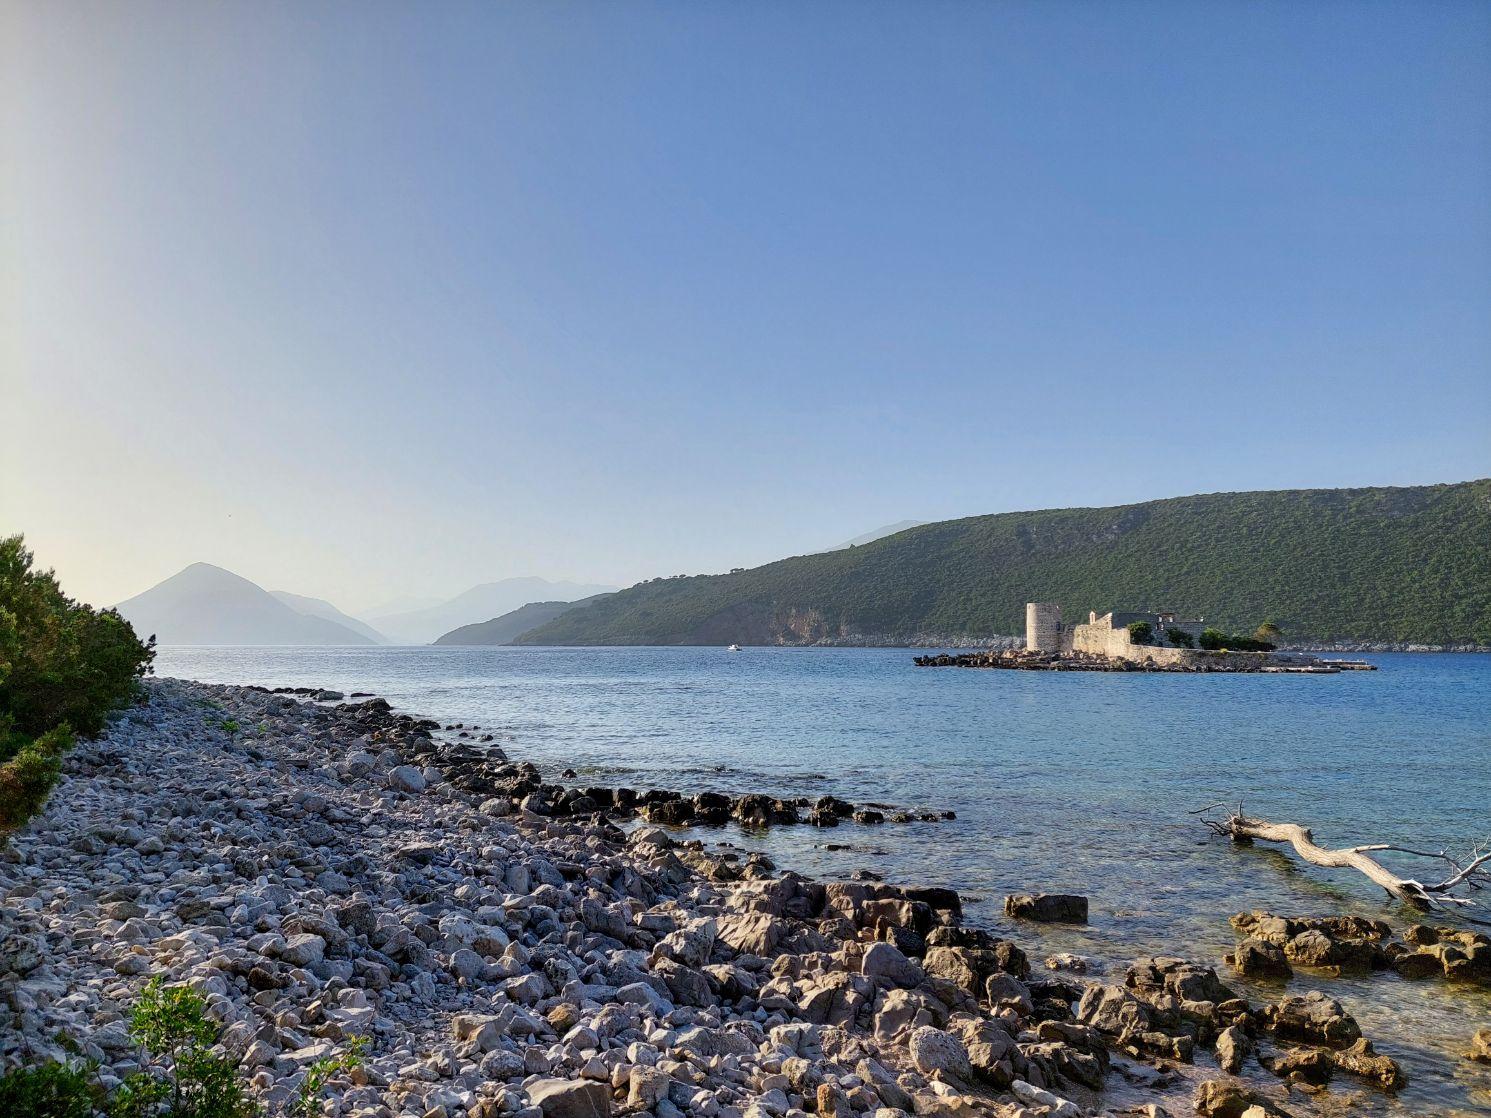 Intrarea in golful Kotor, dinspre Adriatica